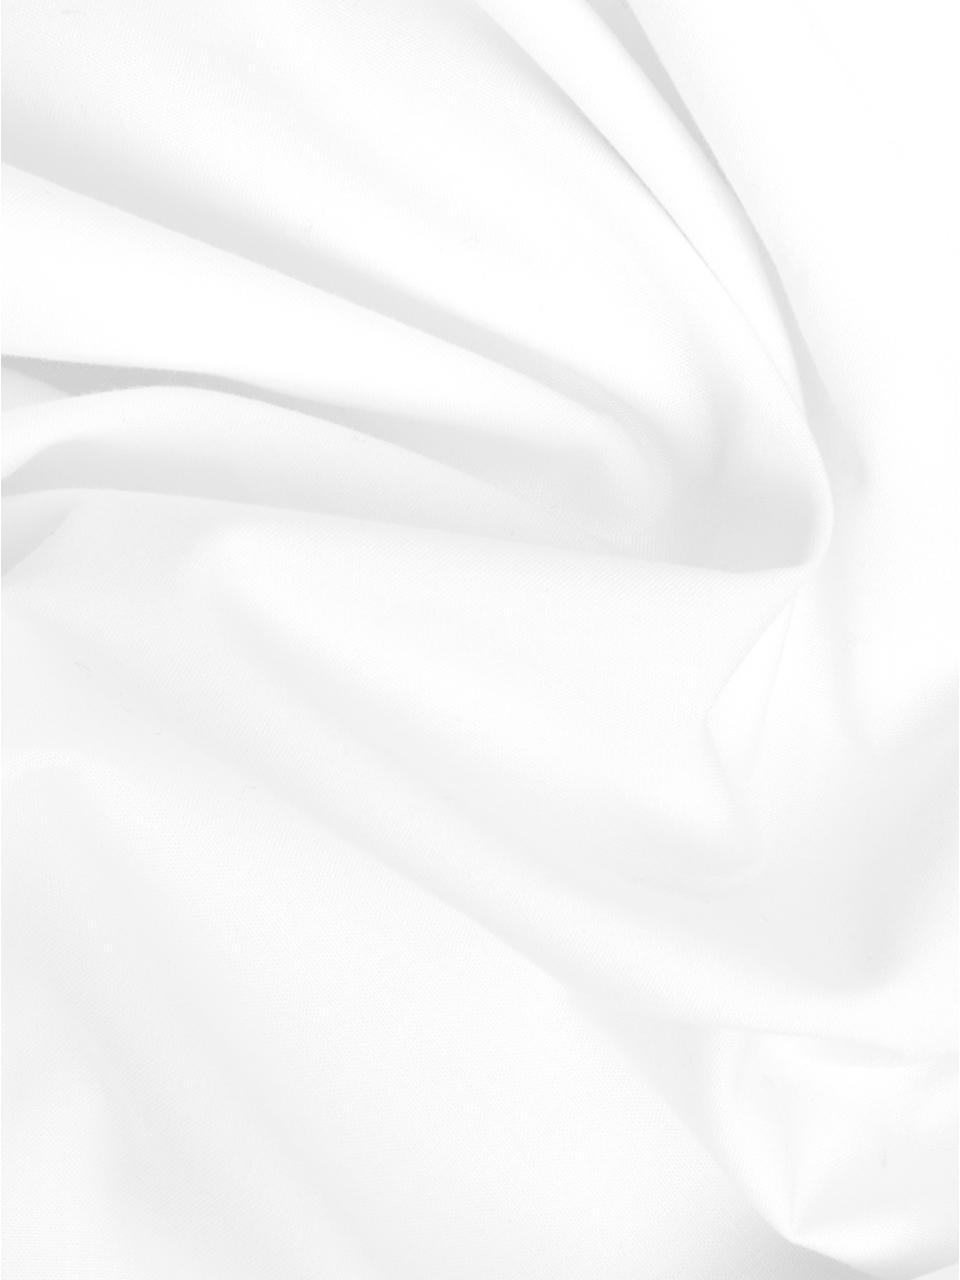 Poszewka na poduszkę z perkalu bawełnianego Joanna, 2 szt., Biały, szary, S 40 x D 80 cm